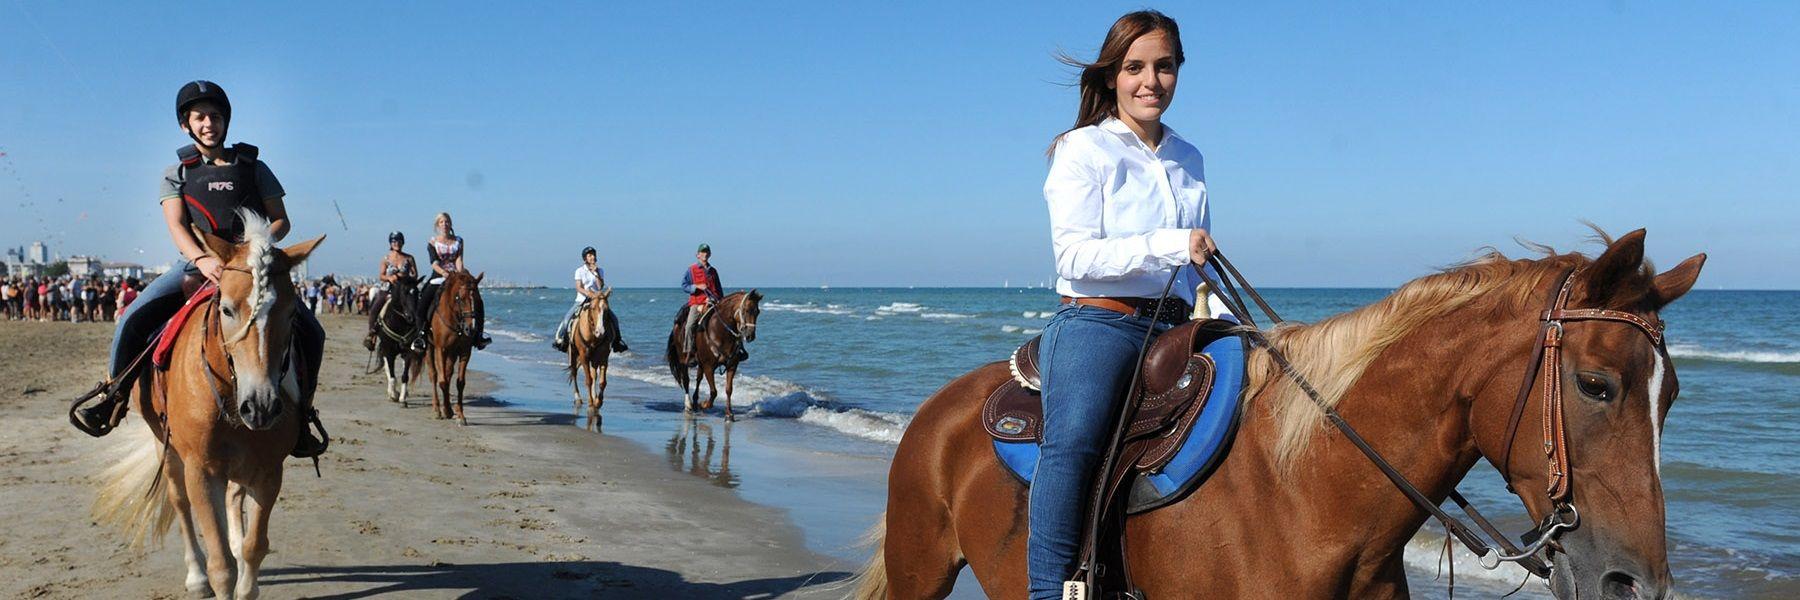 Riding along the Sea